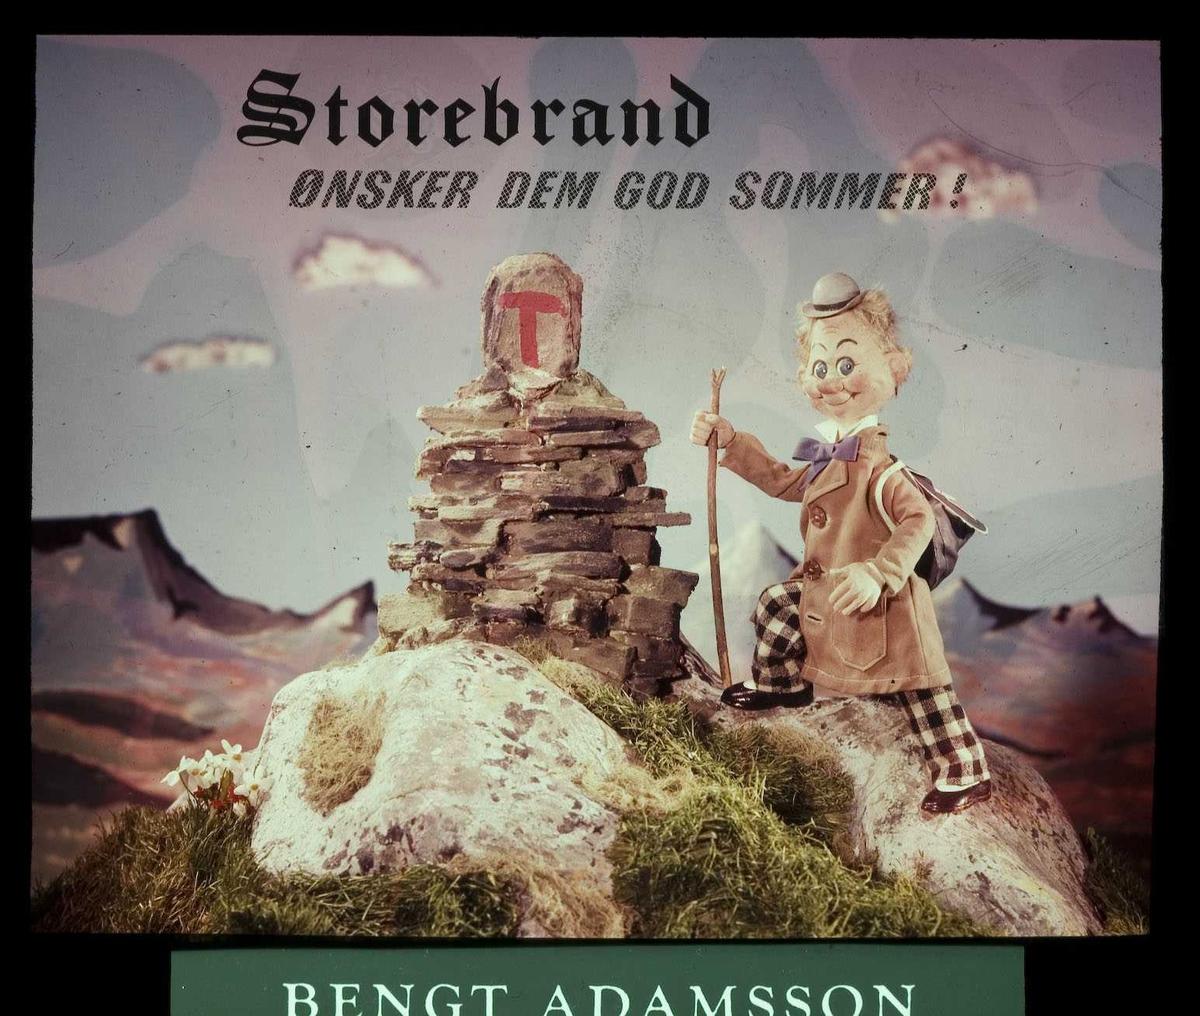 Kinoreklame fra Ski for Storebrand forsikring. Storebrand ønsker Dem god sommer! Agent Bengt Adamsson